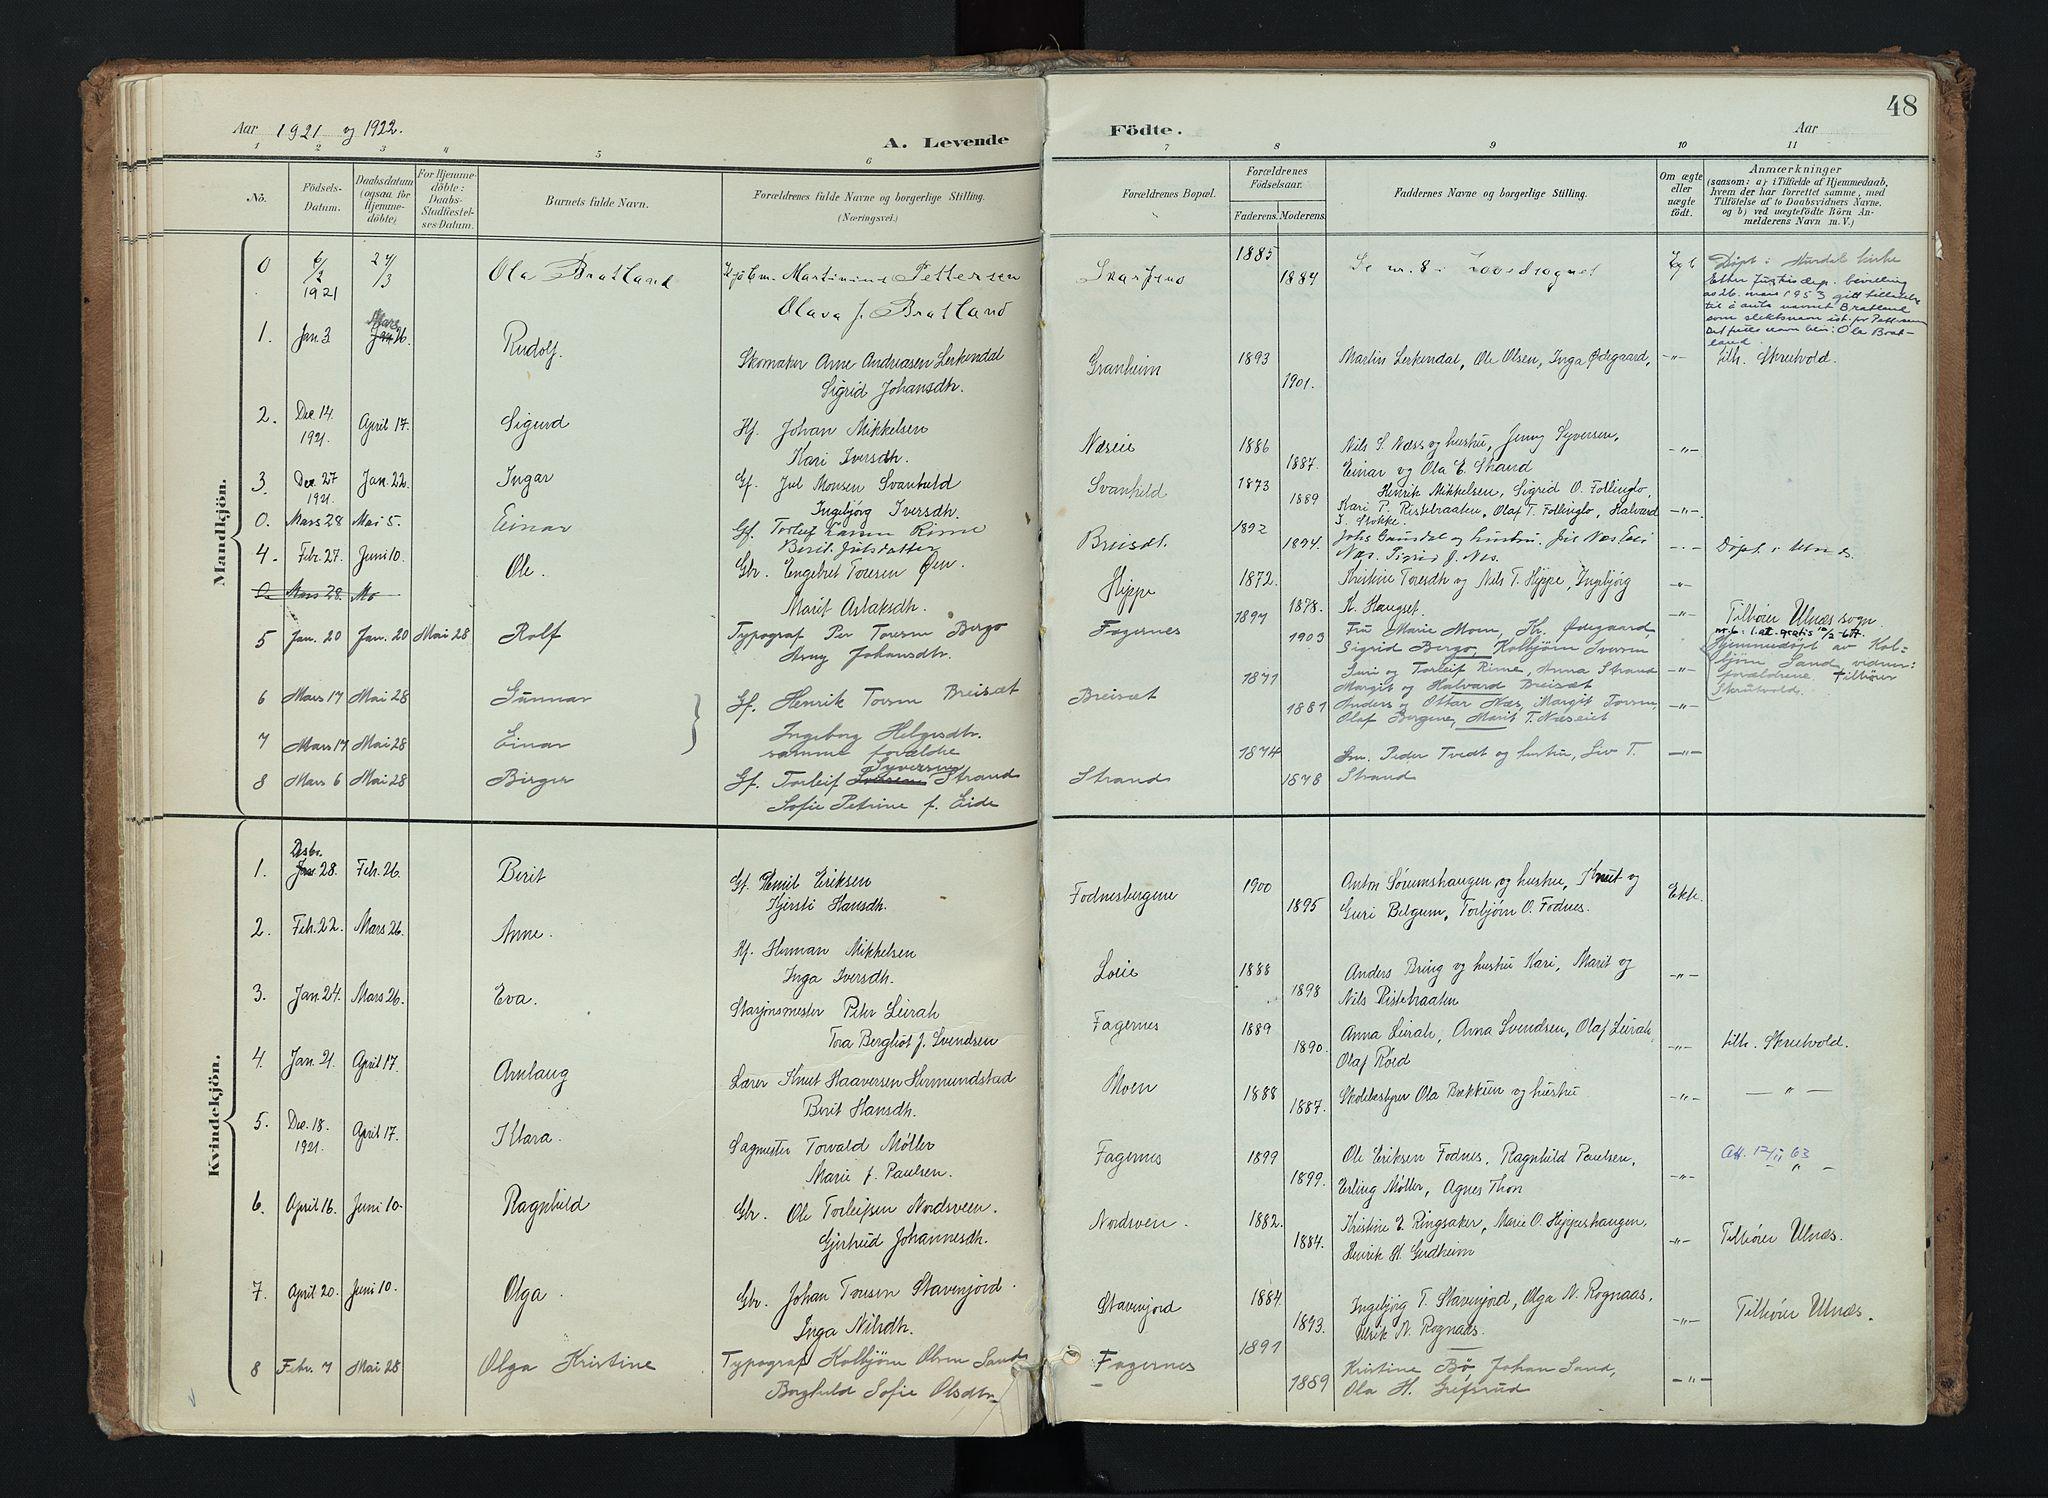 SAH, Nord-Aurdal prestekontor, Ministerialbok nr. 16, 1897-1925, s. 48